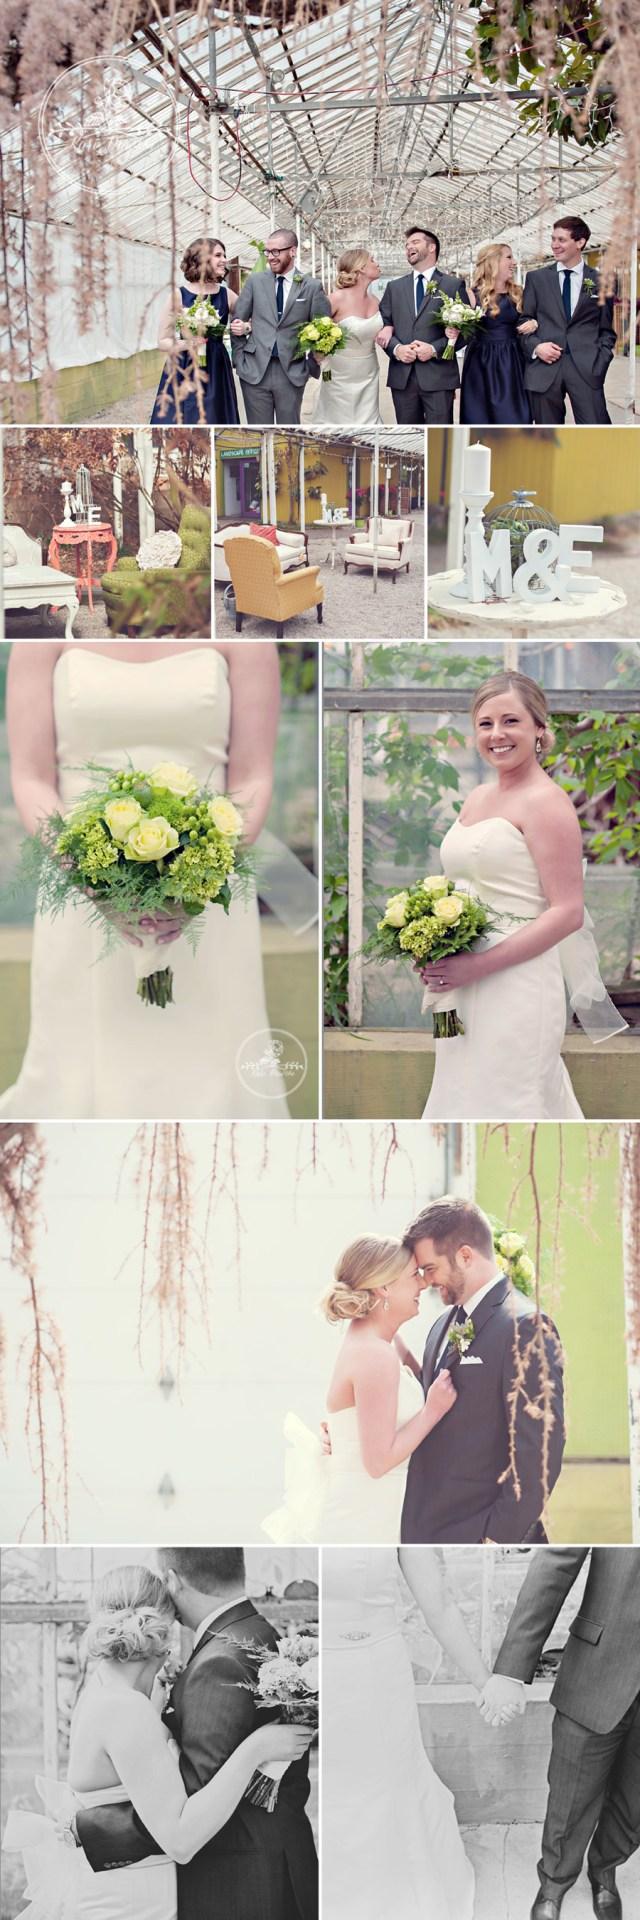 Goldner Walsh Wedding Megan Evan I Do Goldner Walsh Garden Center Wedding